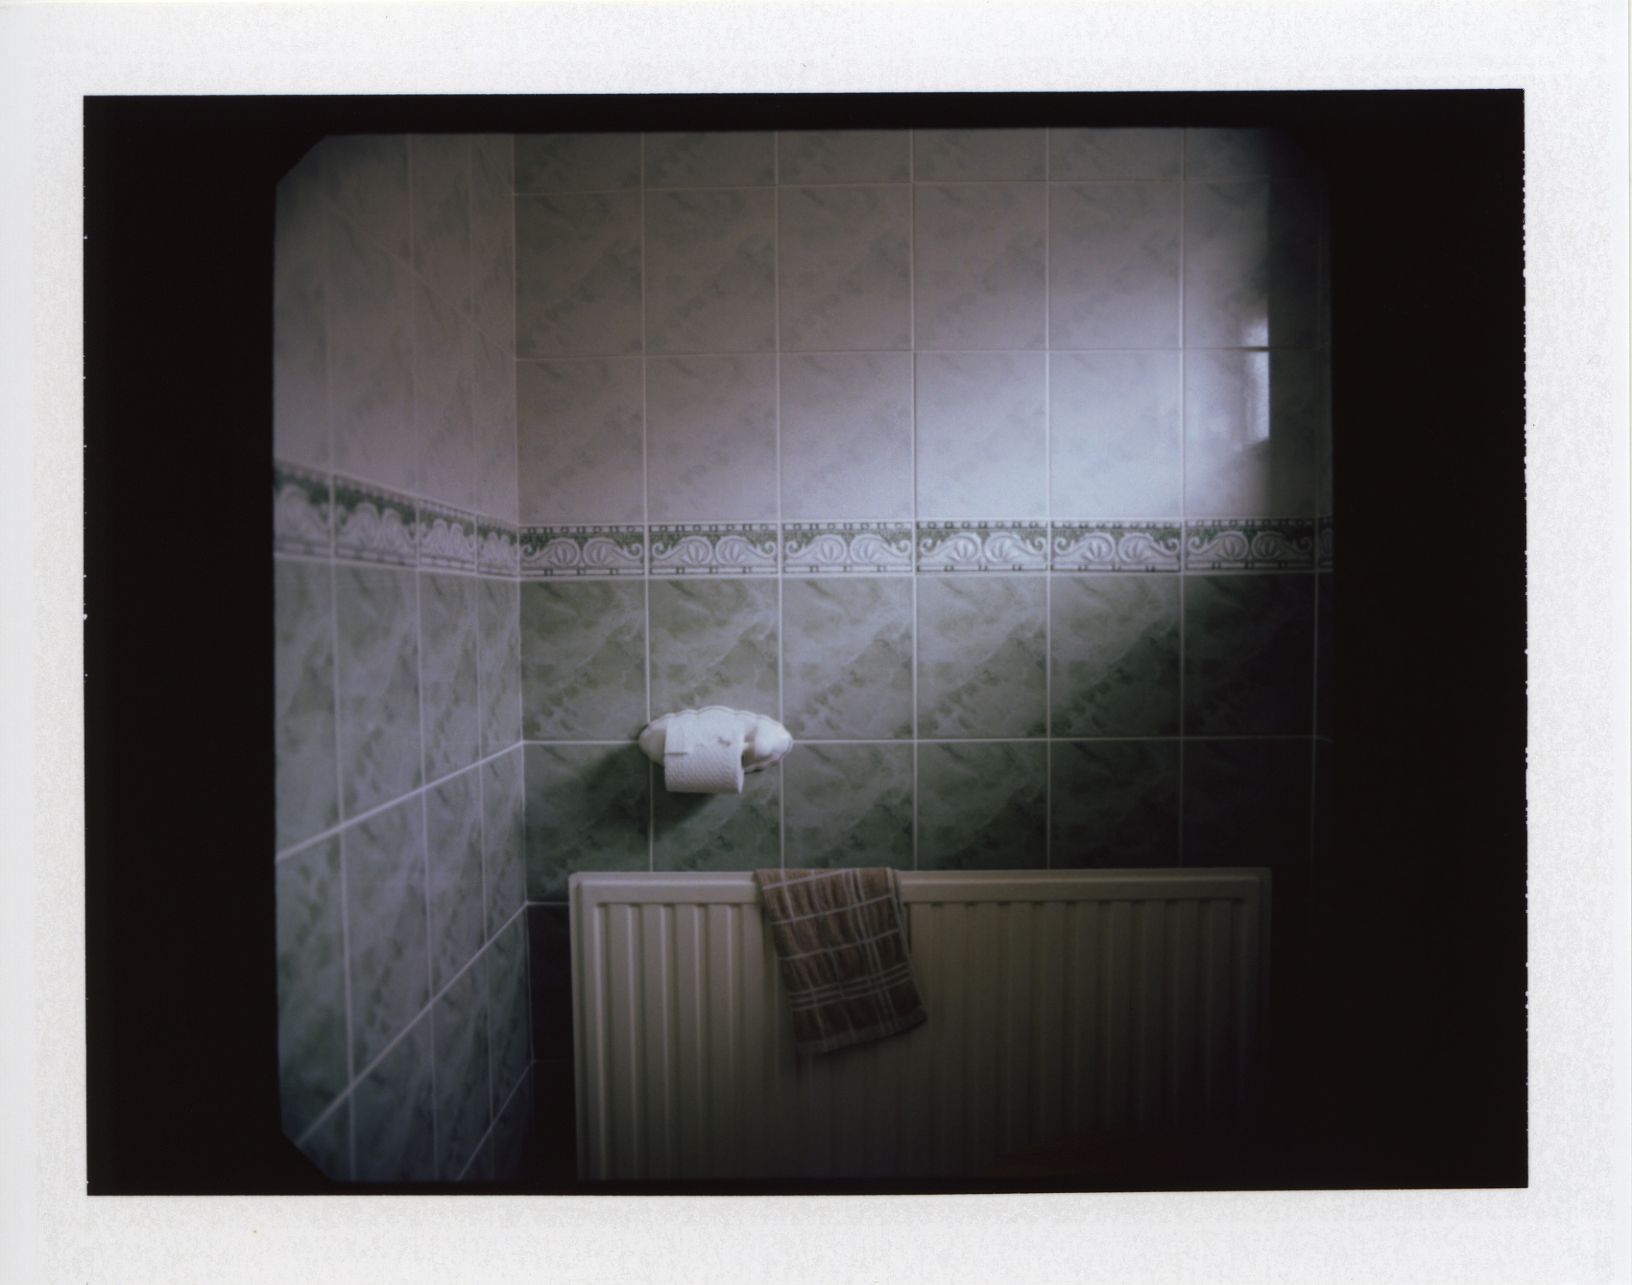 polaroid028sharpen.jpg